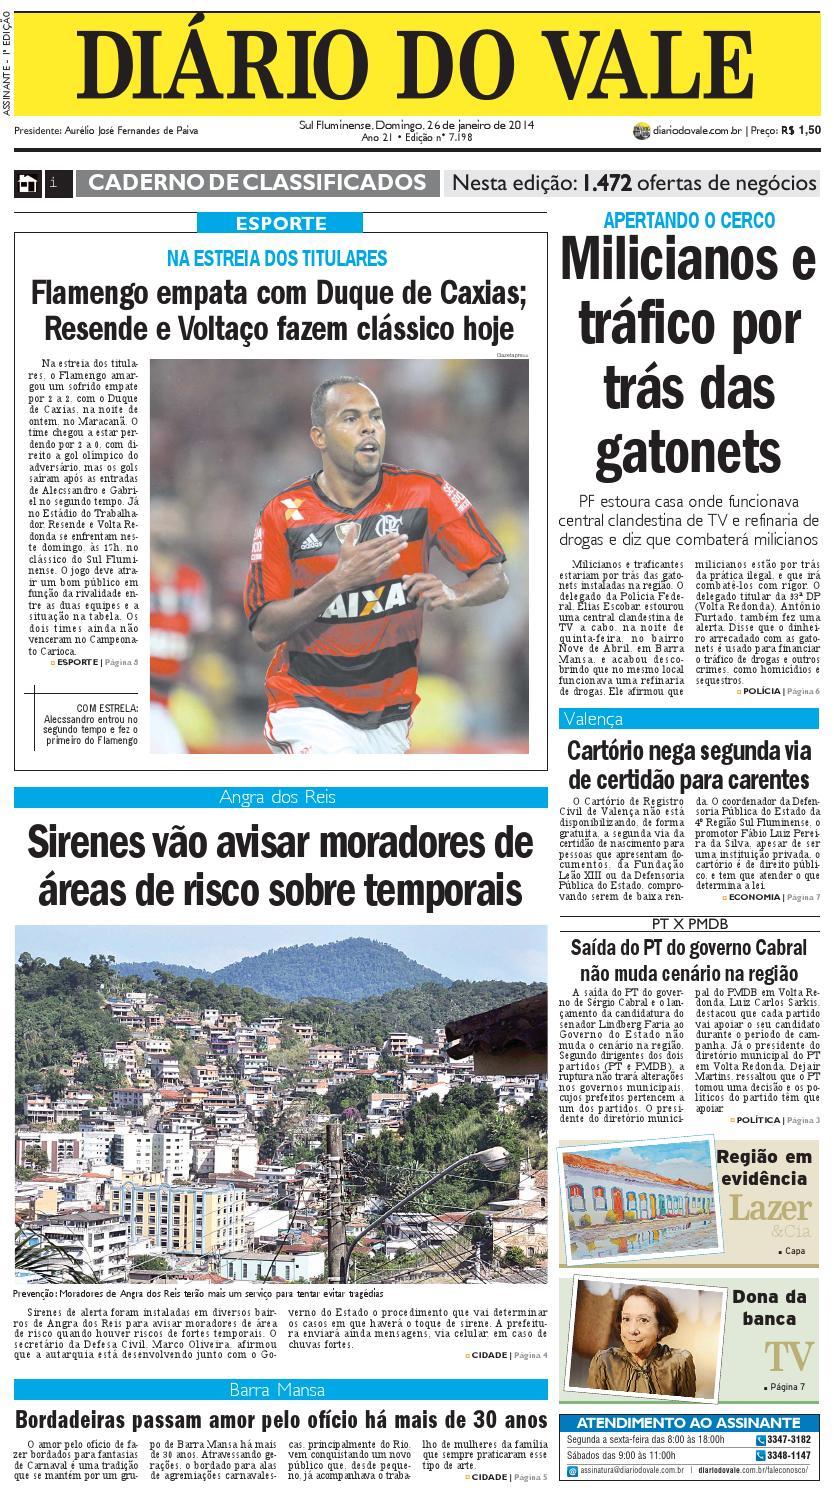 7198 diario do vale domingo 26 01 2014 by Diário do Vale - issuu dba1b5a2ed3fe